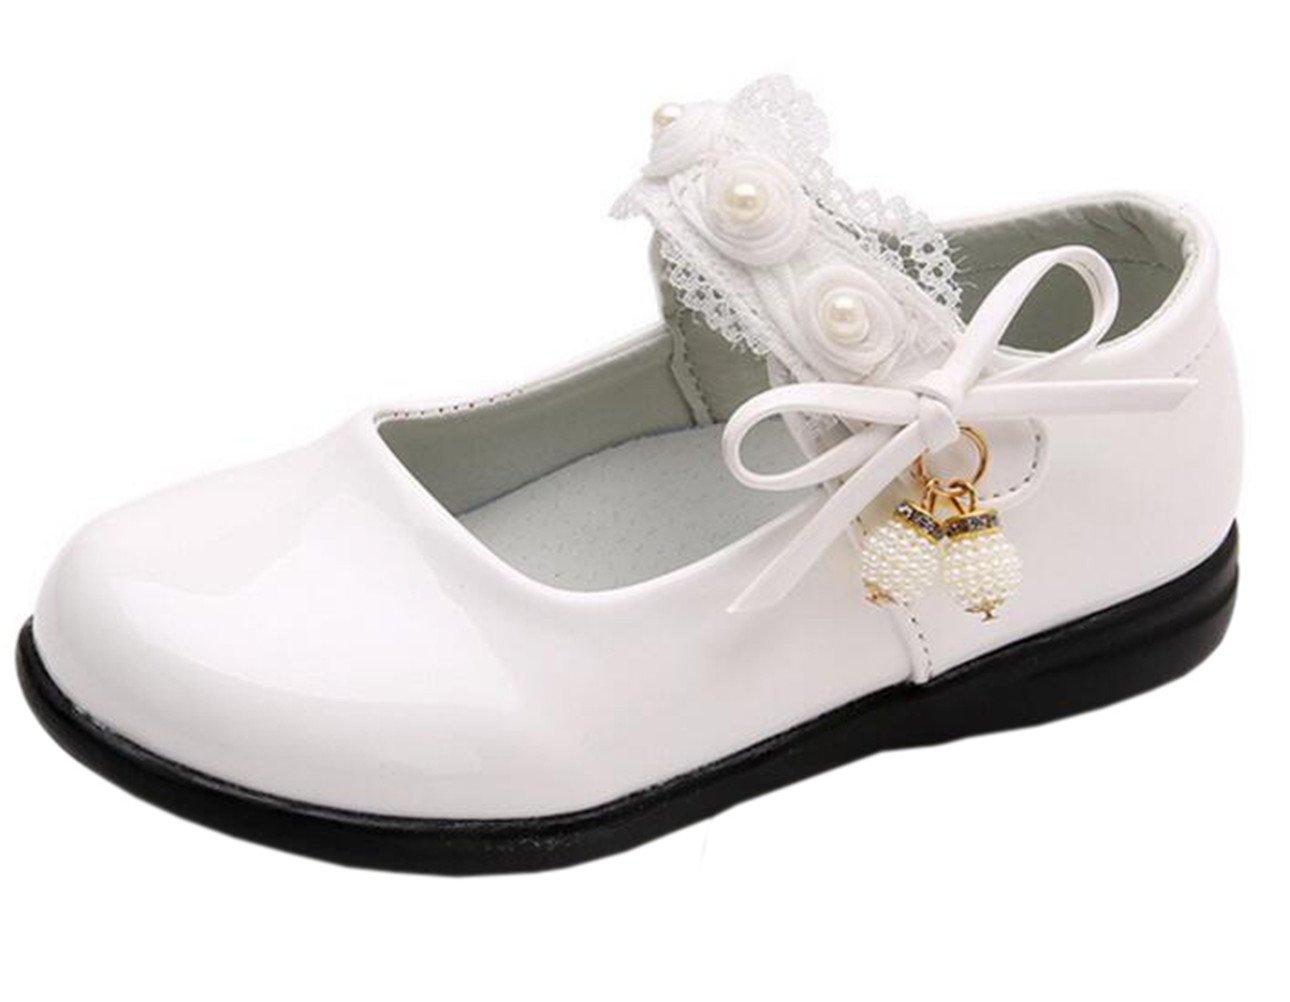 DADAWEN Girl's Strap School Uniform Dress Shoe Mary Jane Flat (Toddler/Little Kid) White US Size 13 M Little Kid